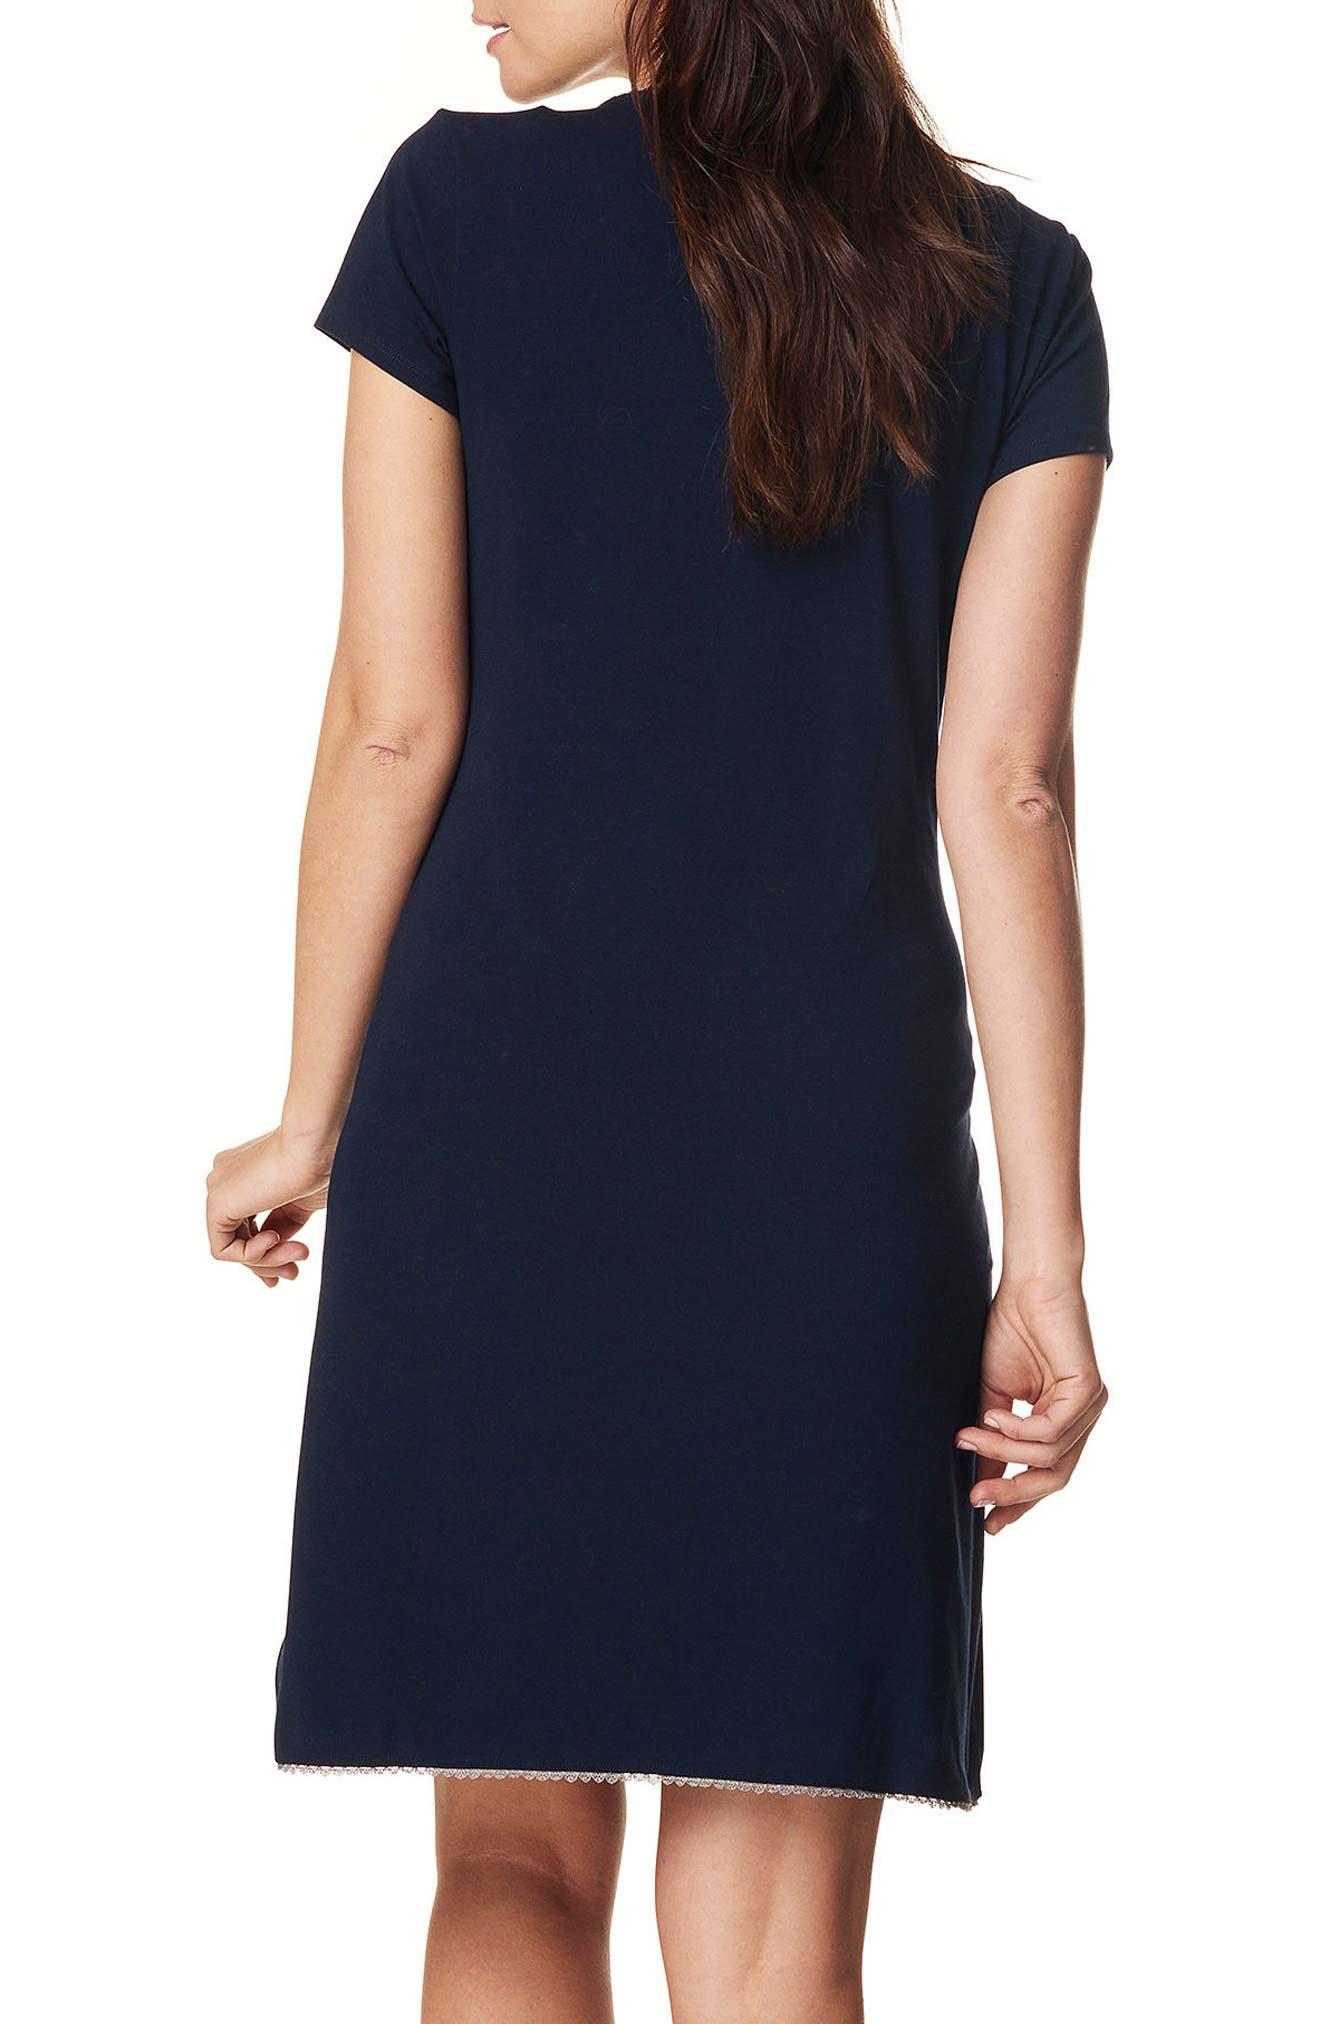 Kimm Maternity/Nursing Jersey Dress,                             Alternate thumbnail 2, color,                             Blue